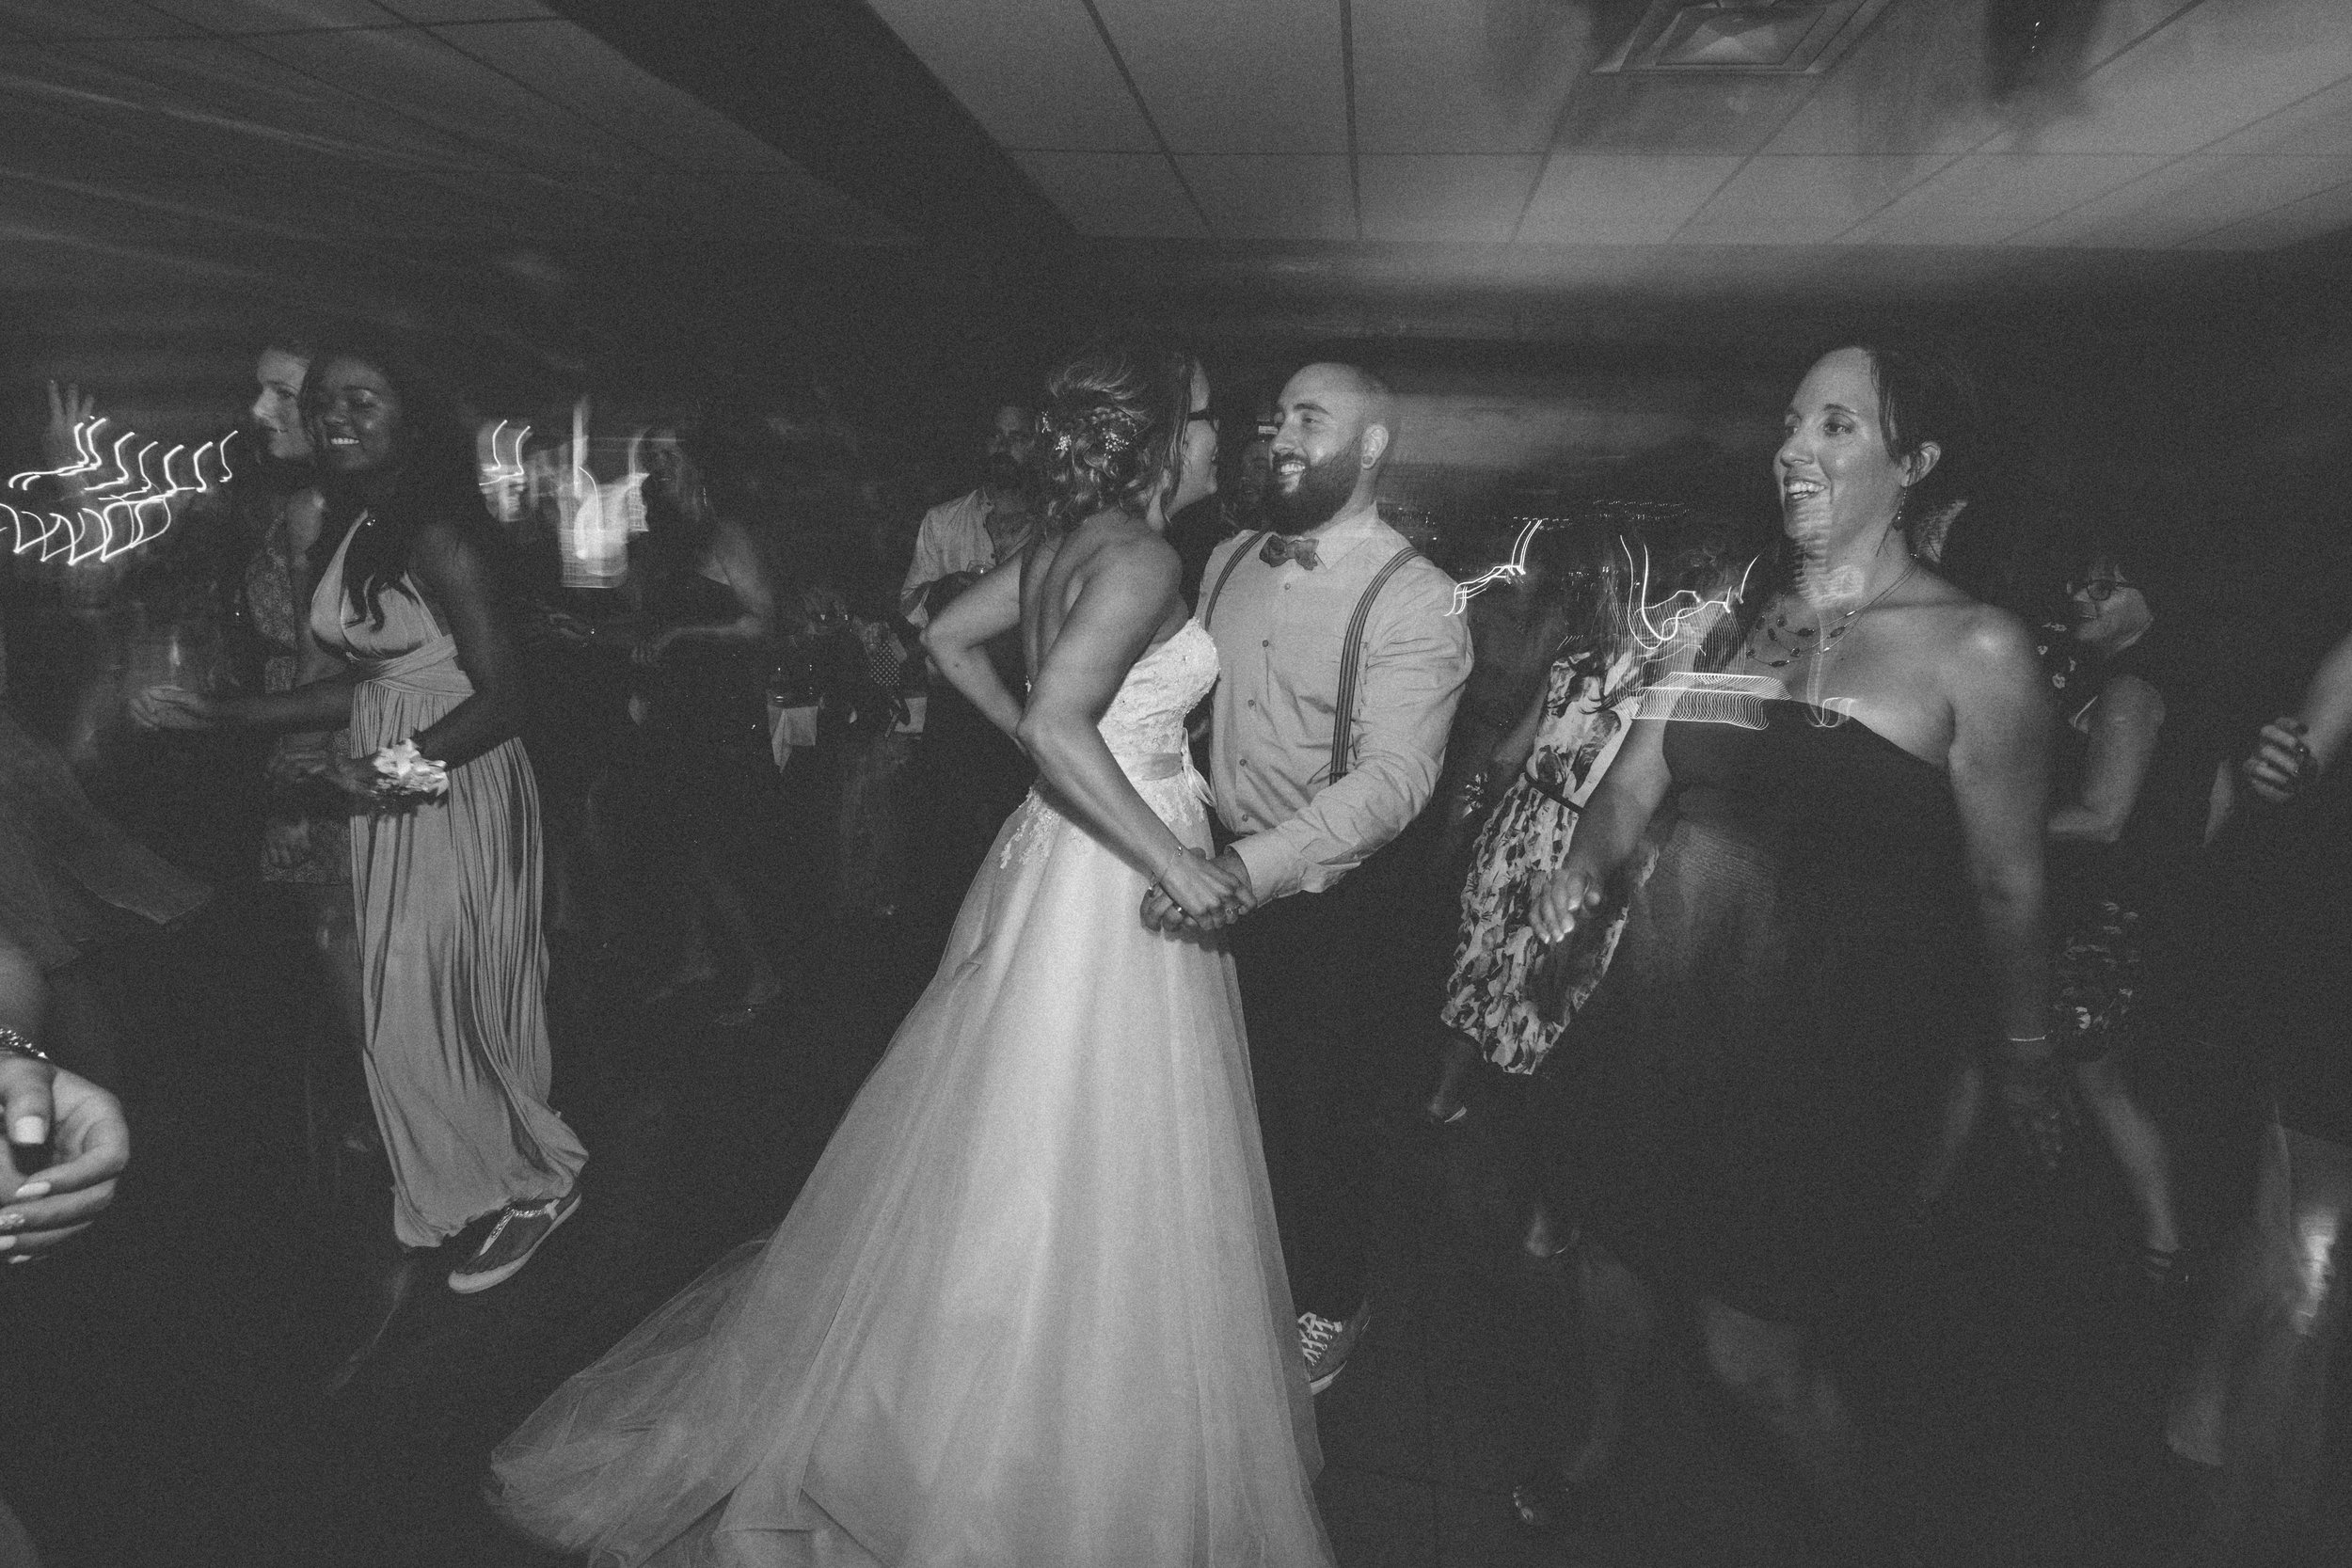 photographe_mariage_gatineau_outaouais_ottawa_photographer_wedding_lifestyle_candid_documentary